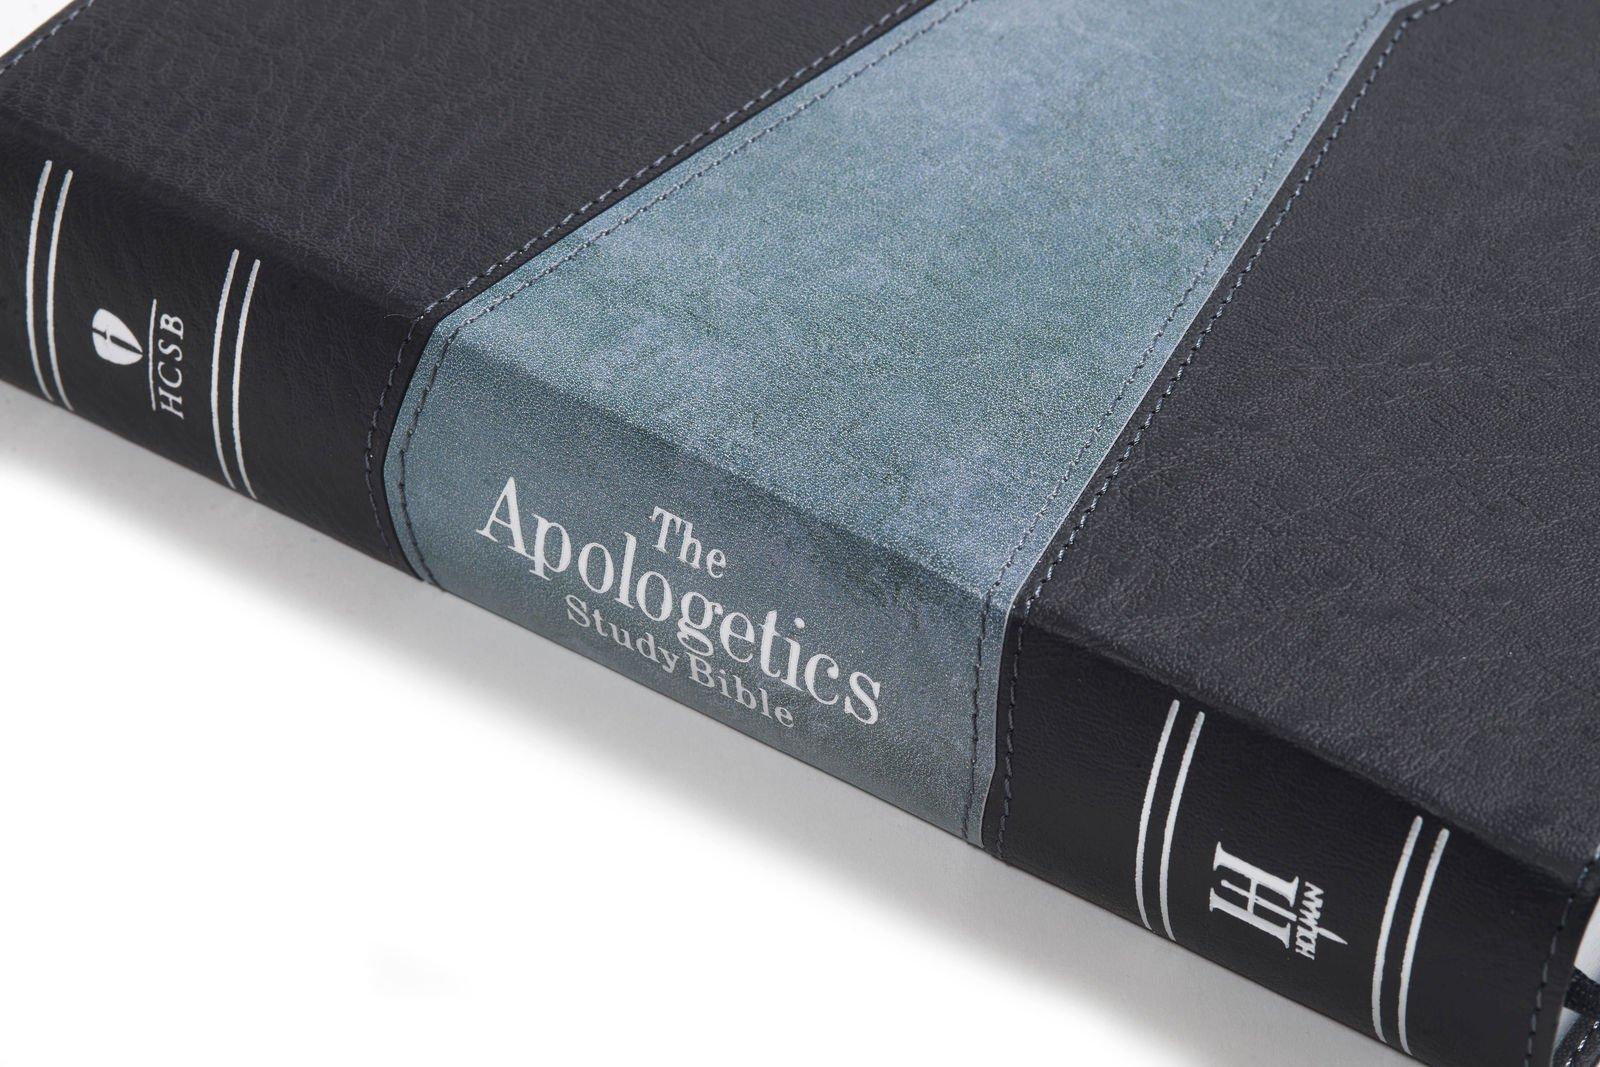 Christian apologetics - Wikipedia